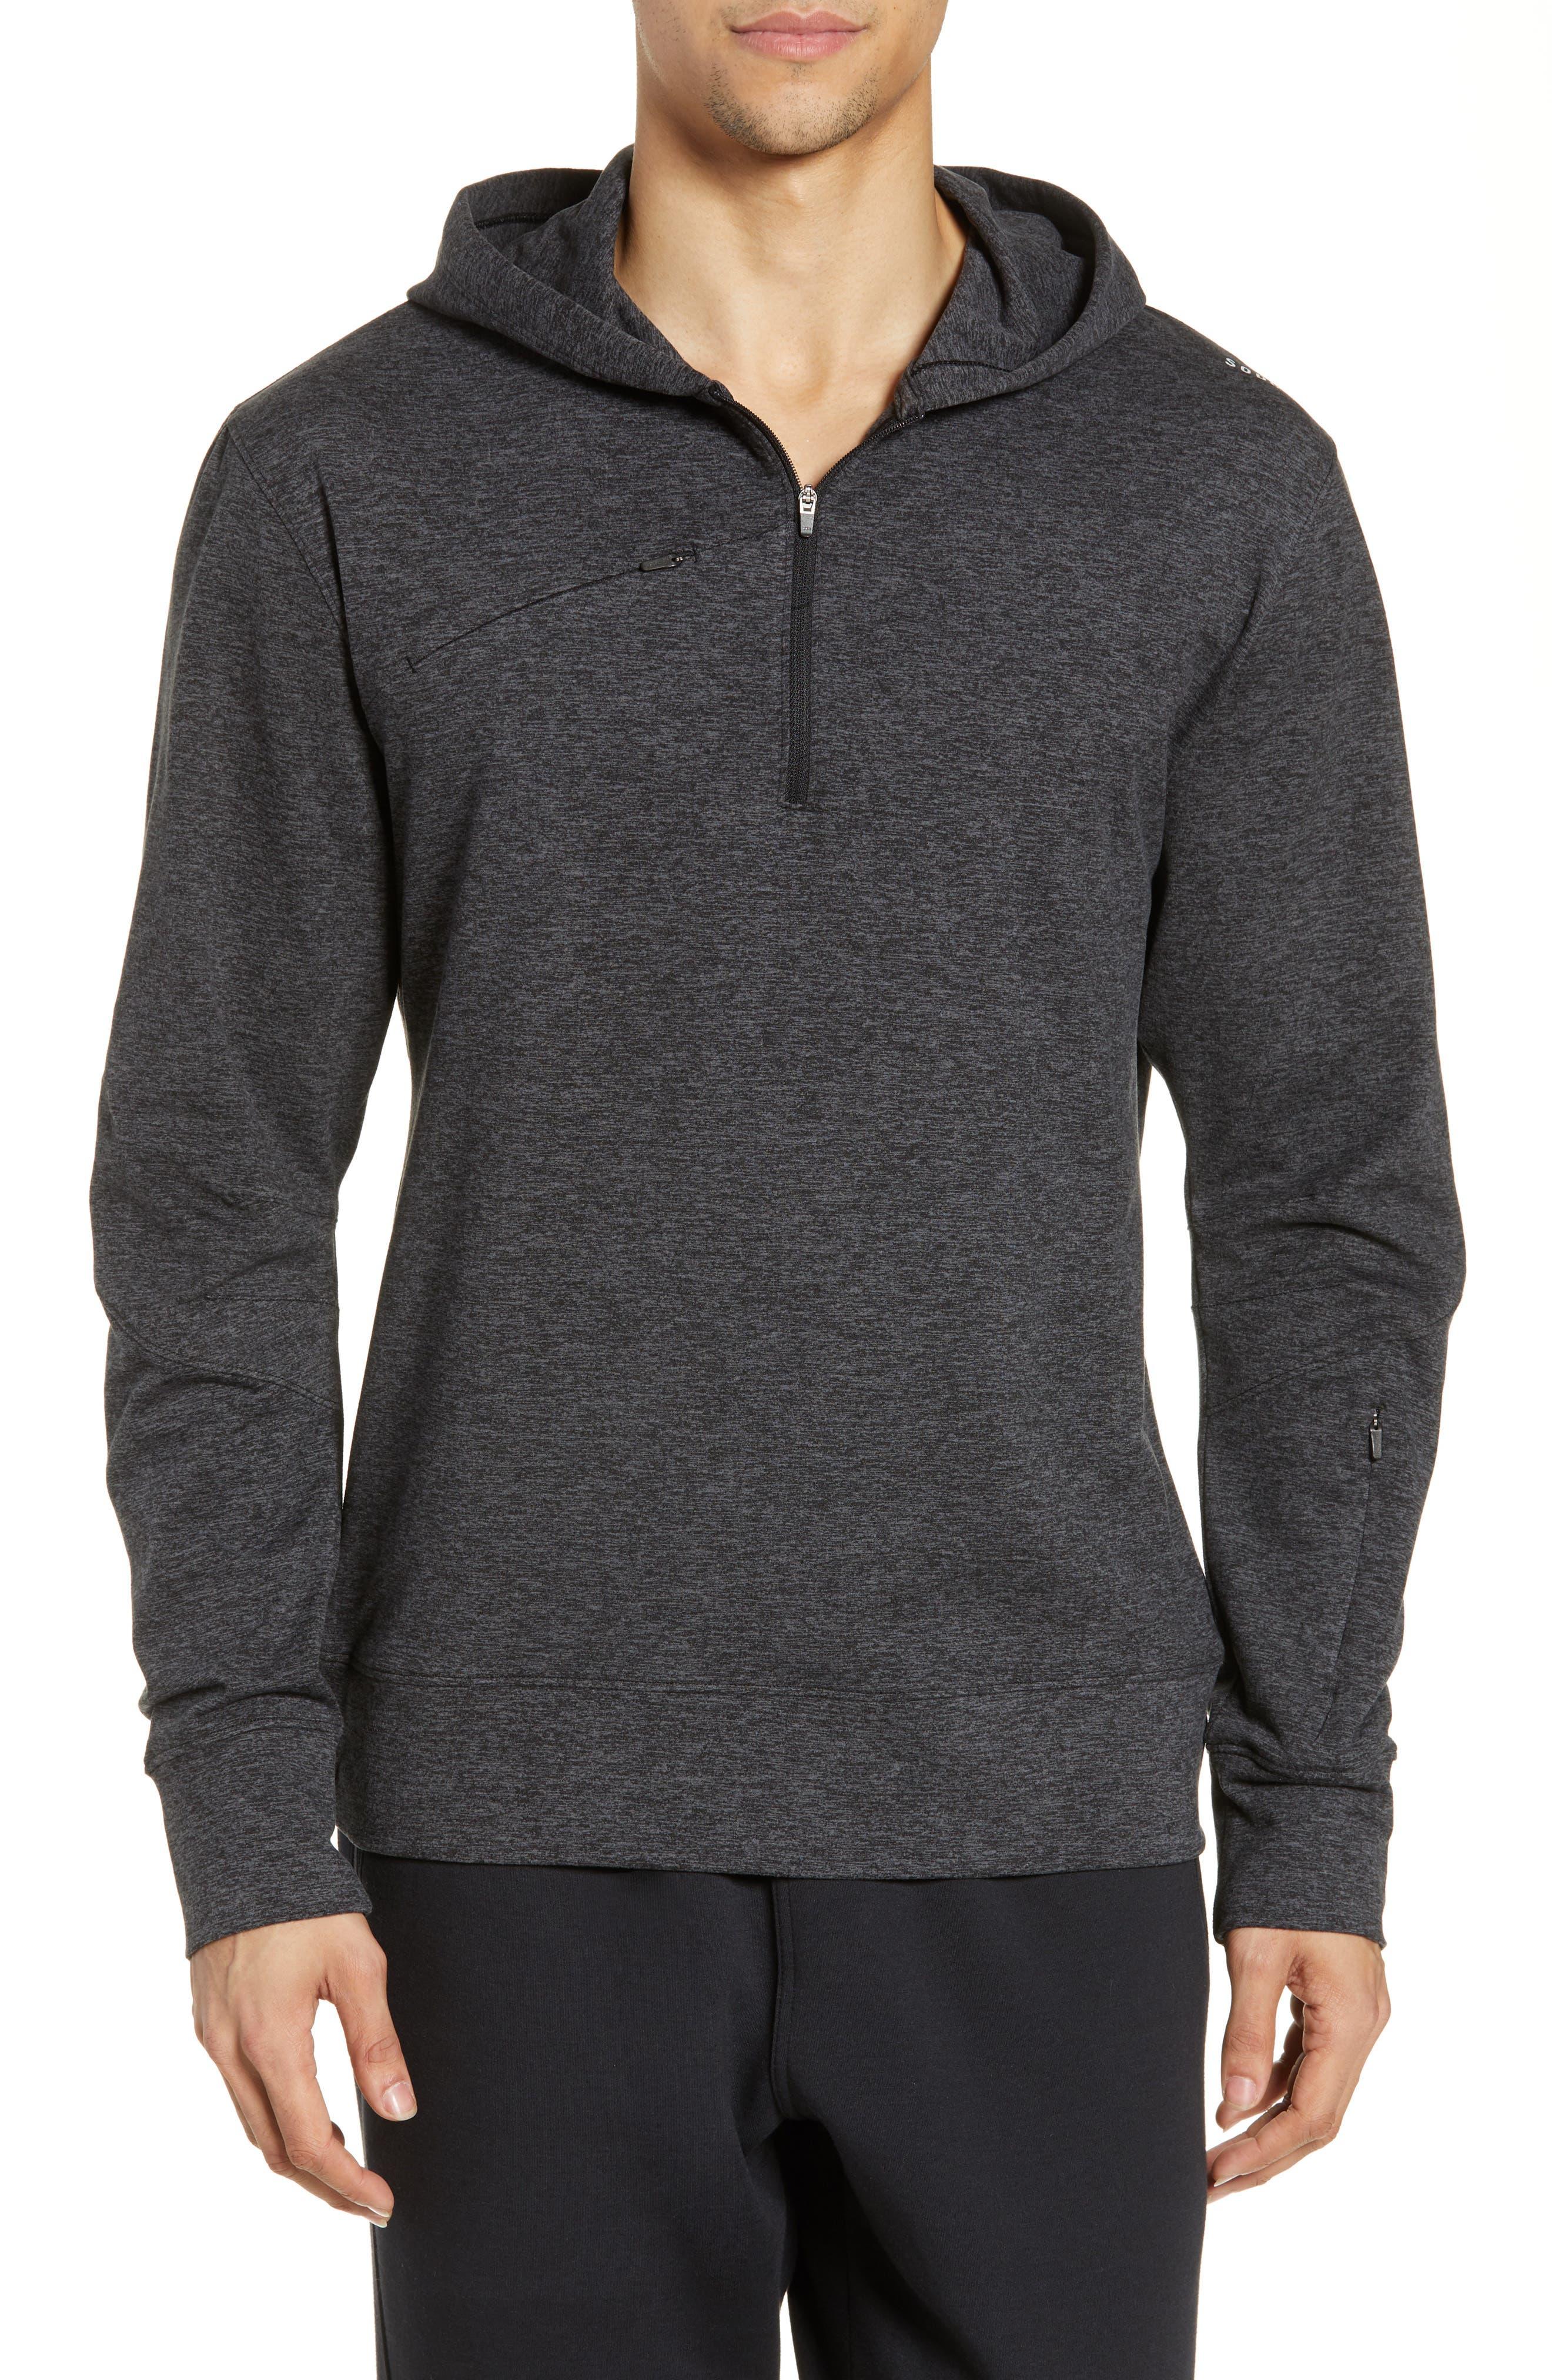 SODO Elevate Hooded Sweatshirt, Main, color, HEATHER CHARCOAL BLACK/ BLACK